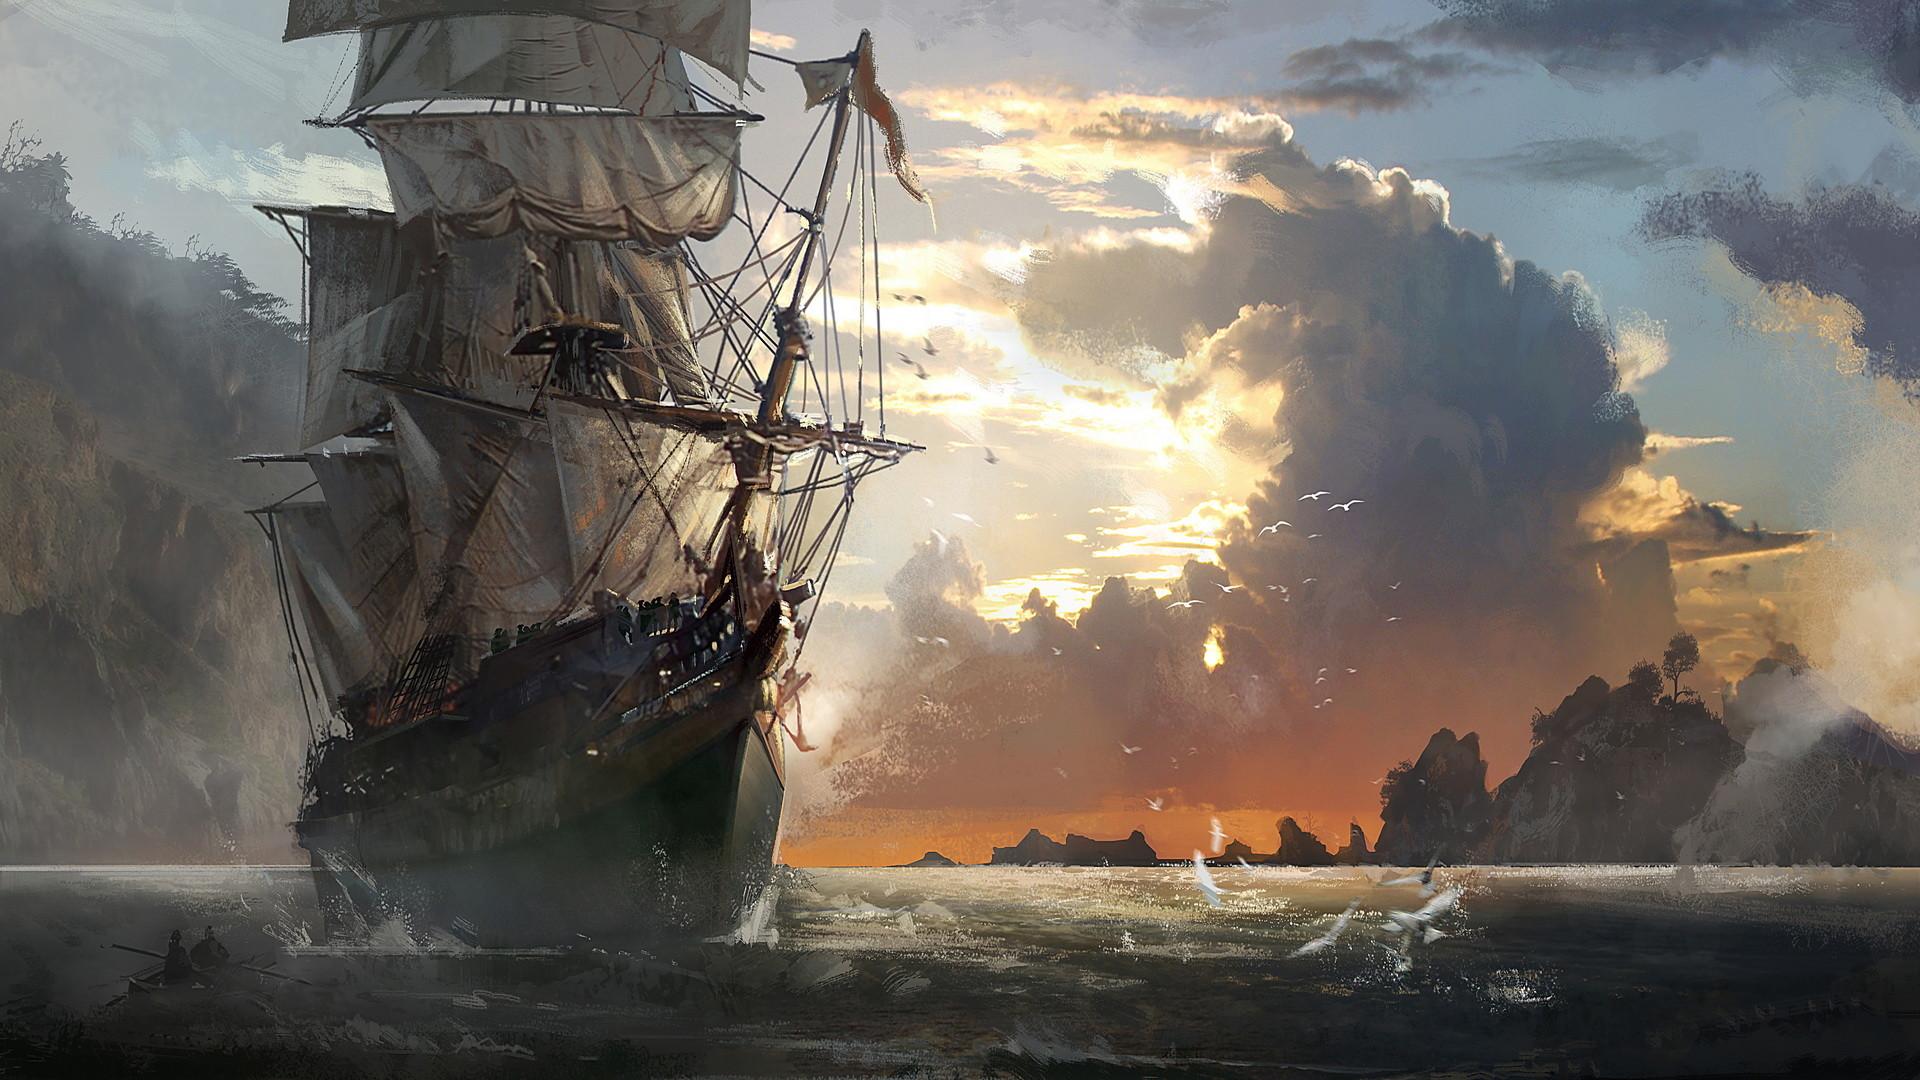 ghost ship wallpaper 183��